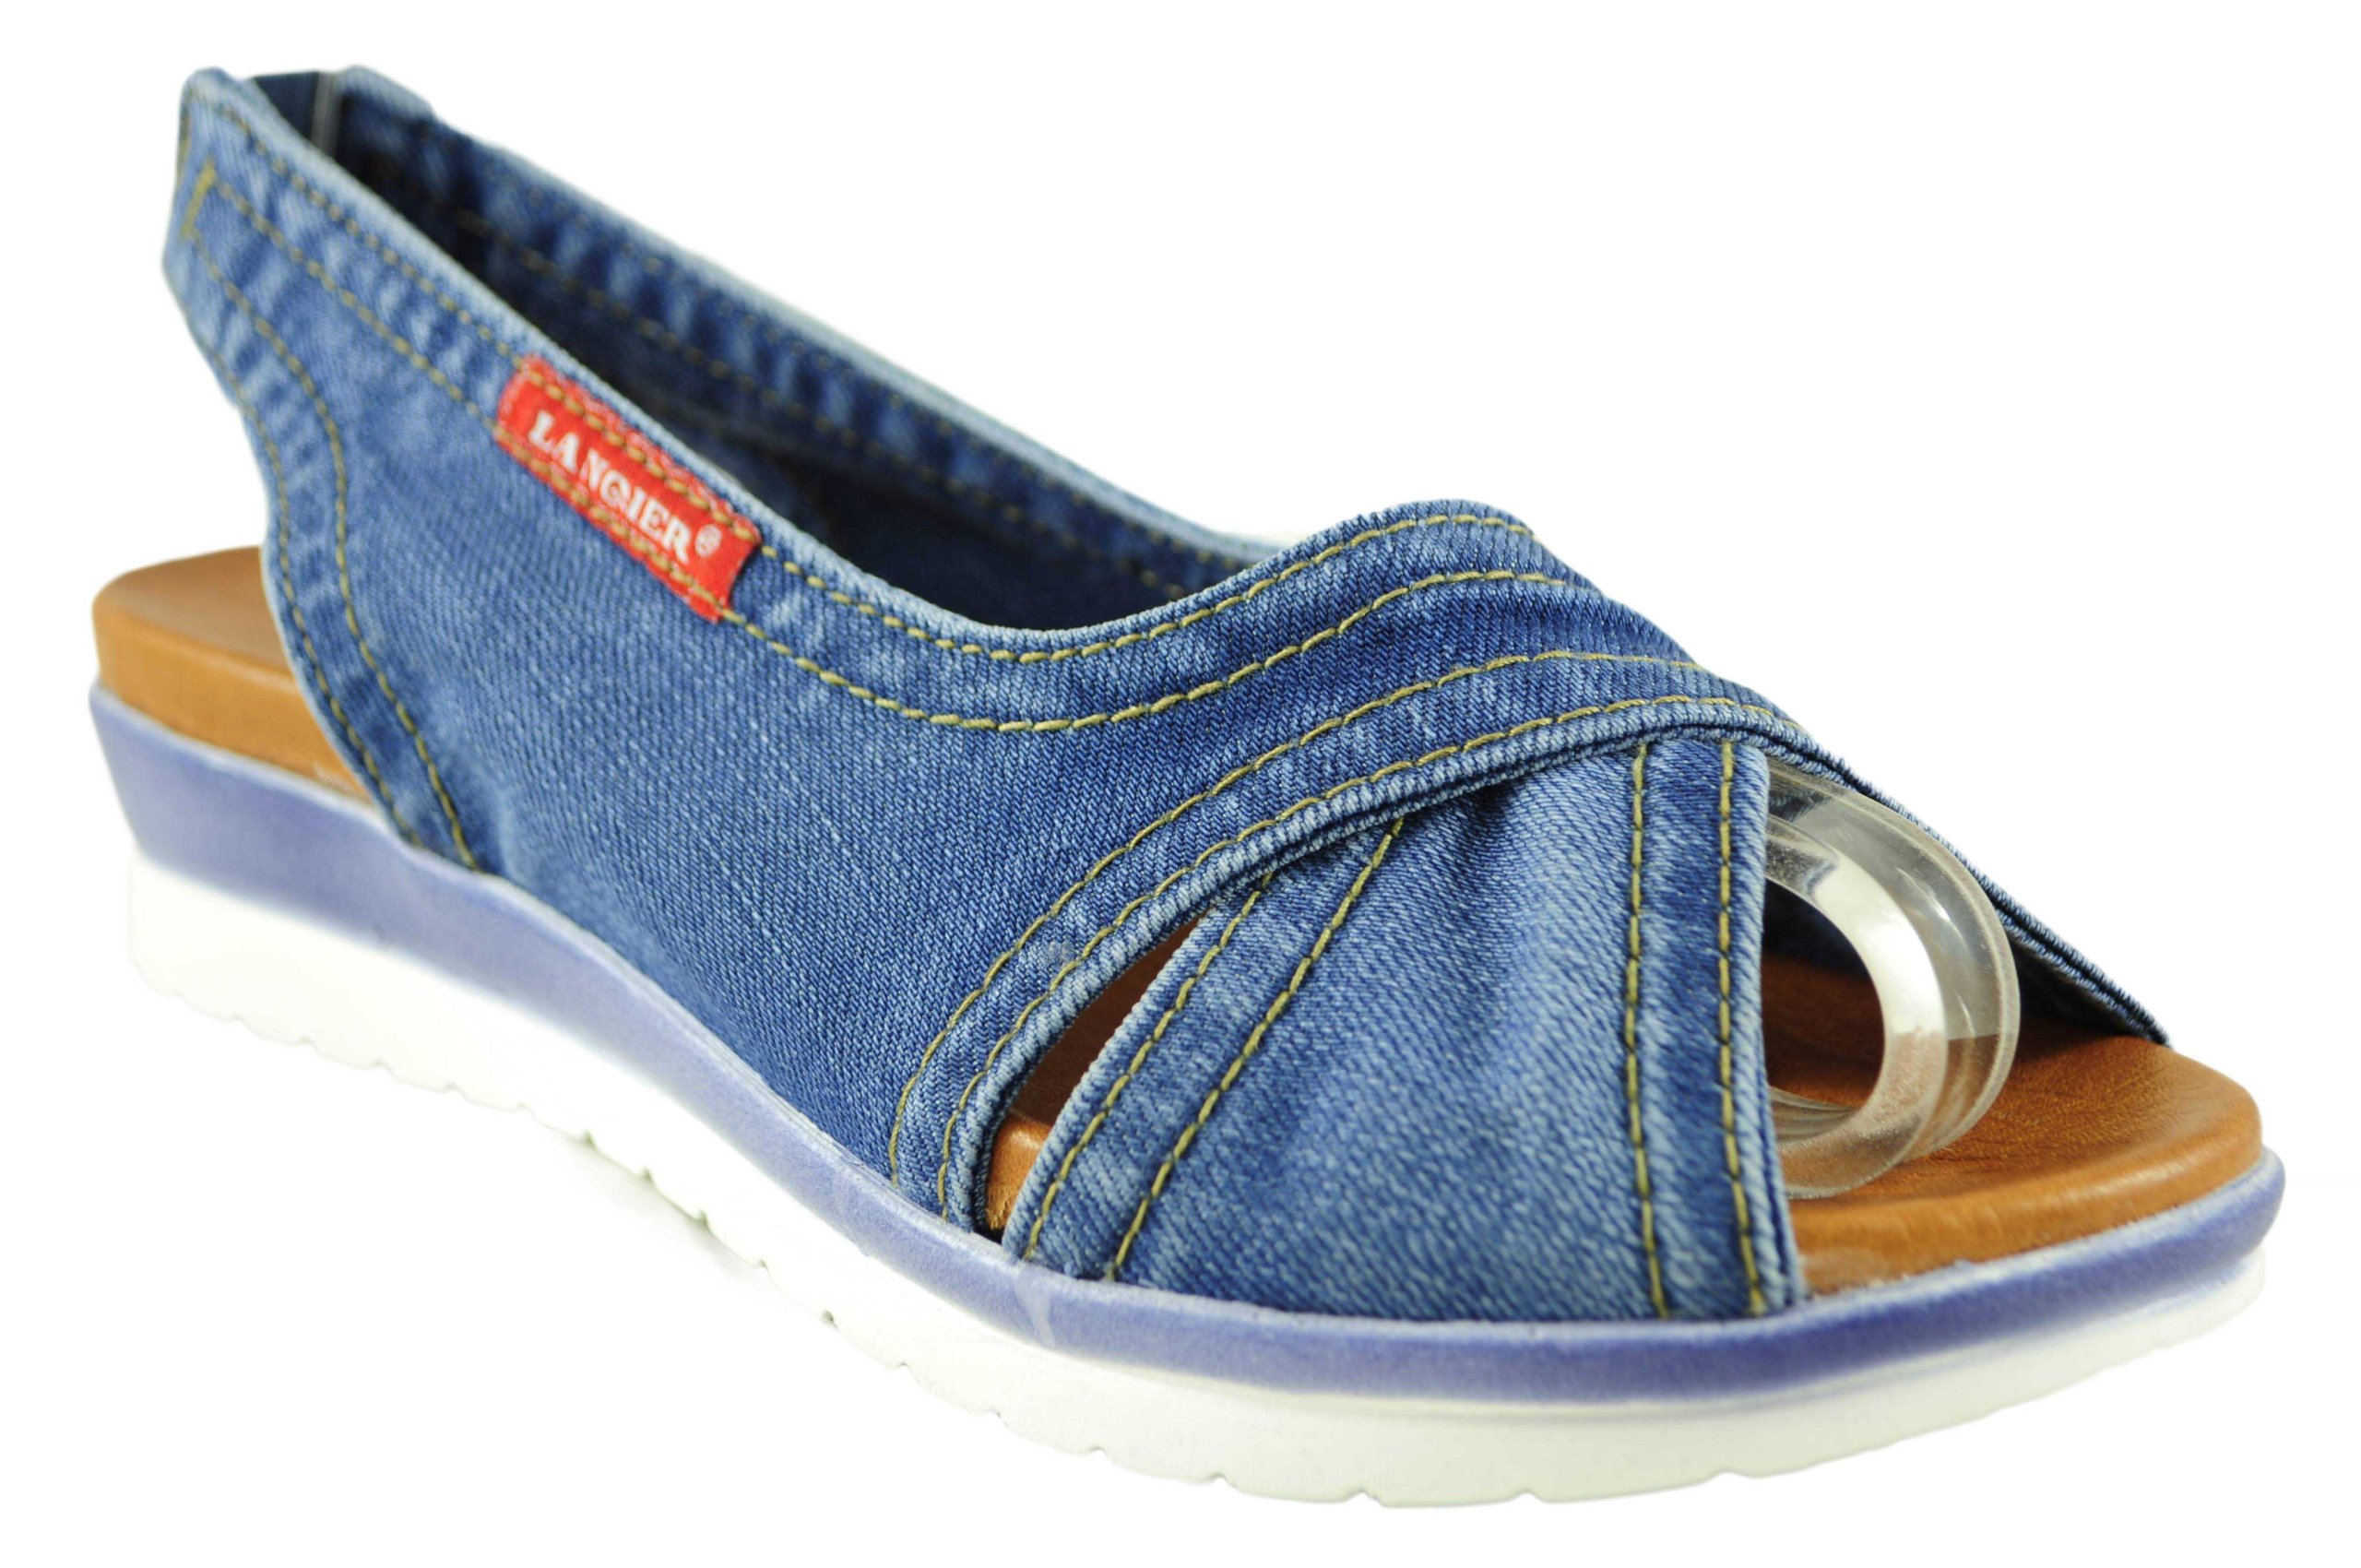 e14c0cc13c57e Lanqier płaskie sandały jeans denim HIT 42C210 39 - 7314170592 ...